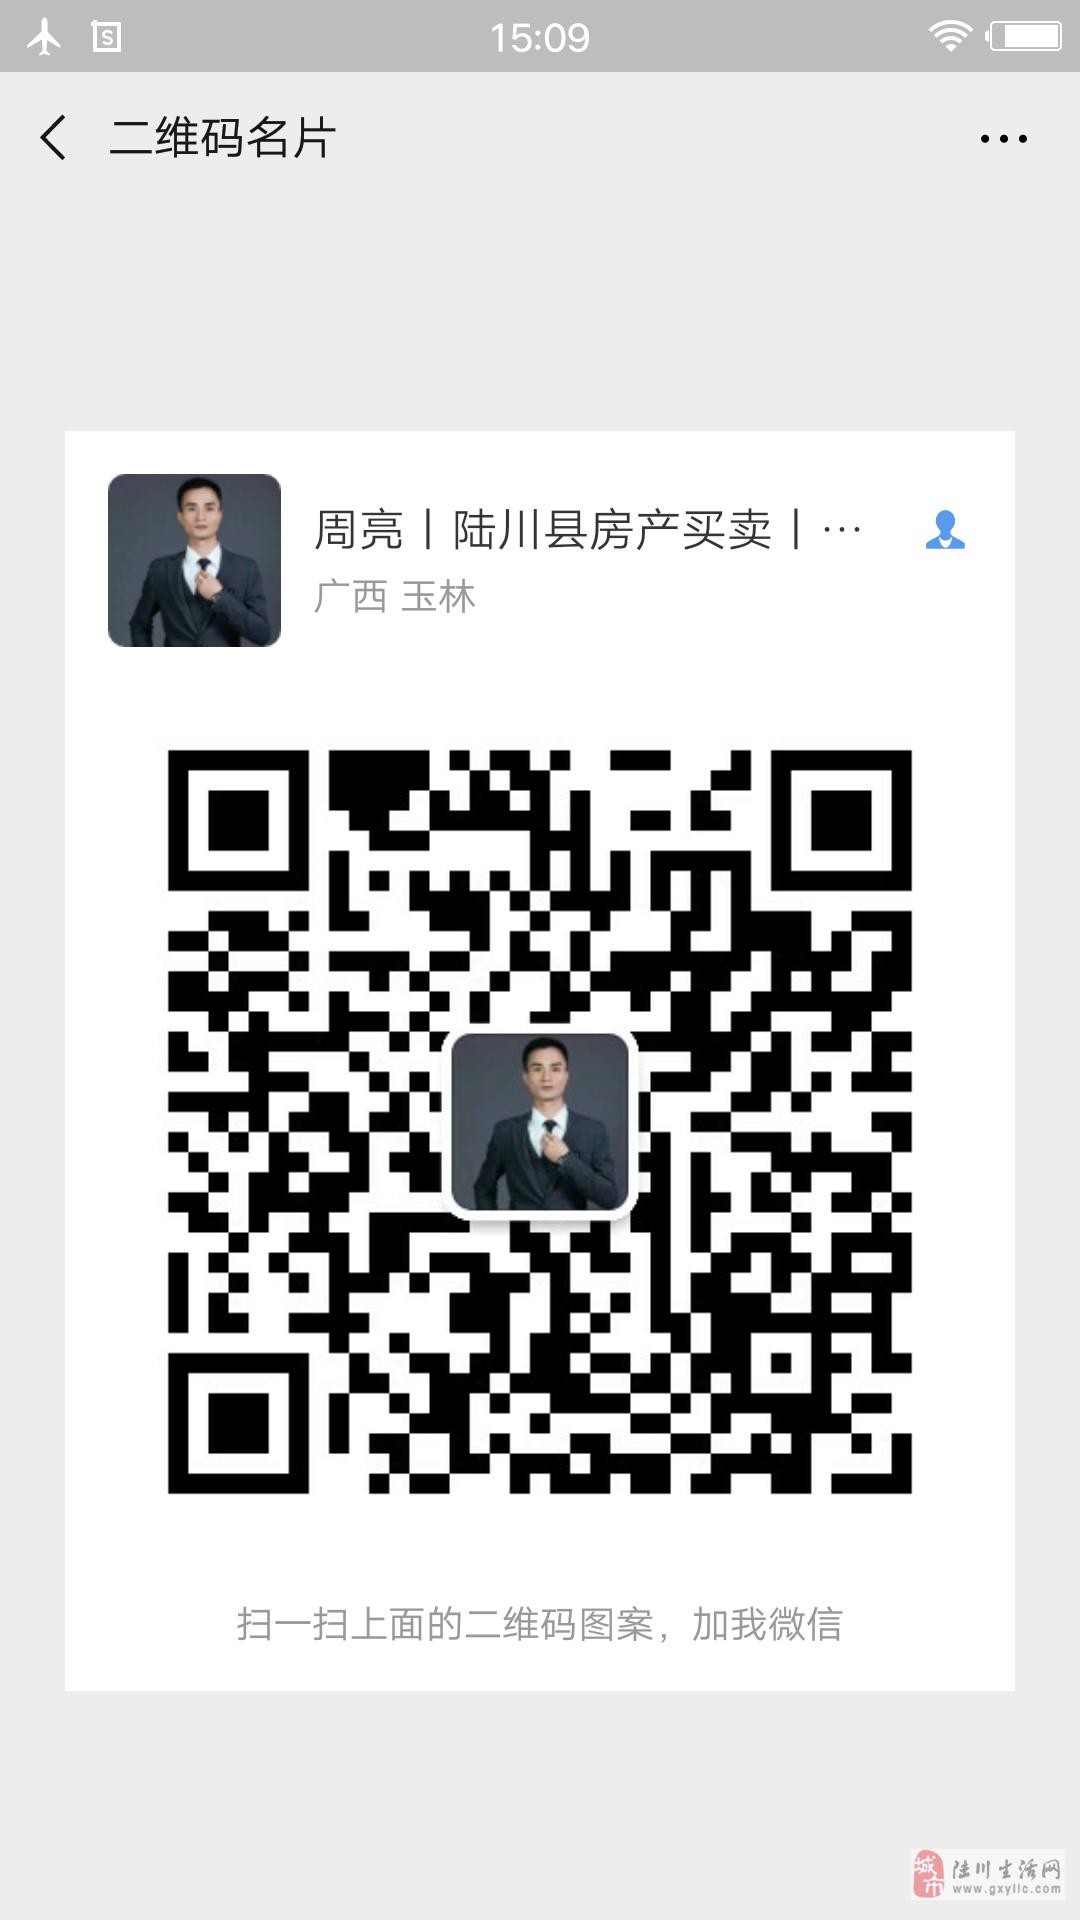 2020qq红包免费领取碧桂城3室2厅2卫52.56万元抄底价出售